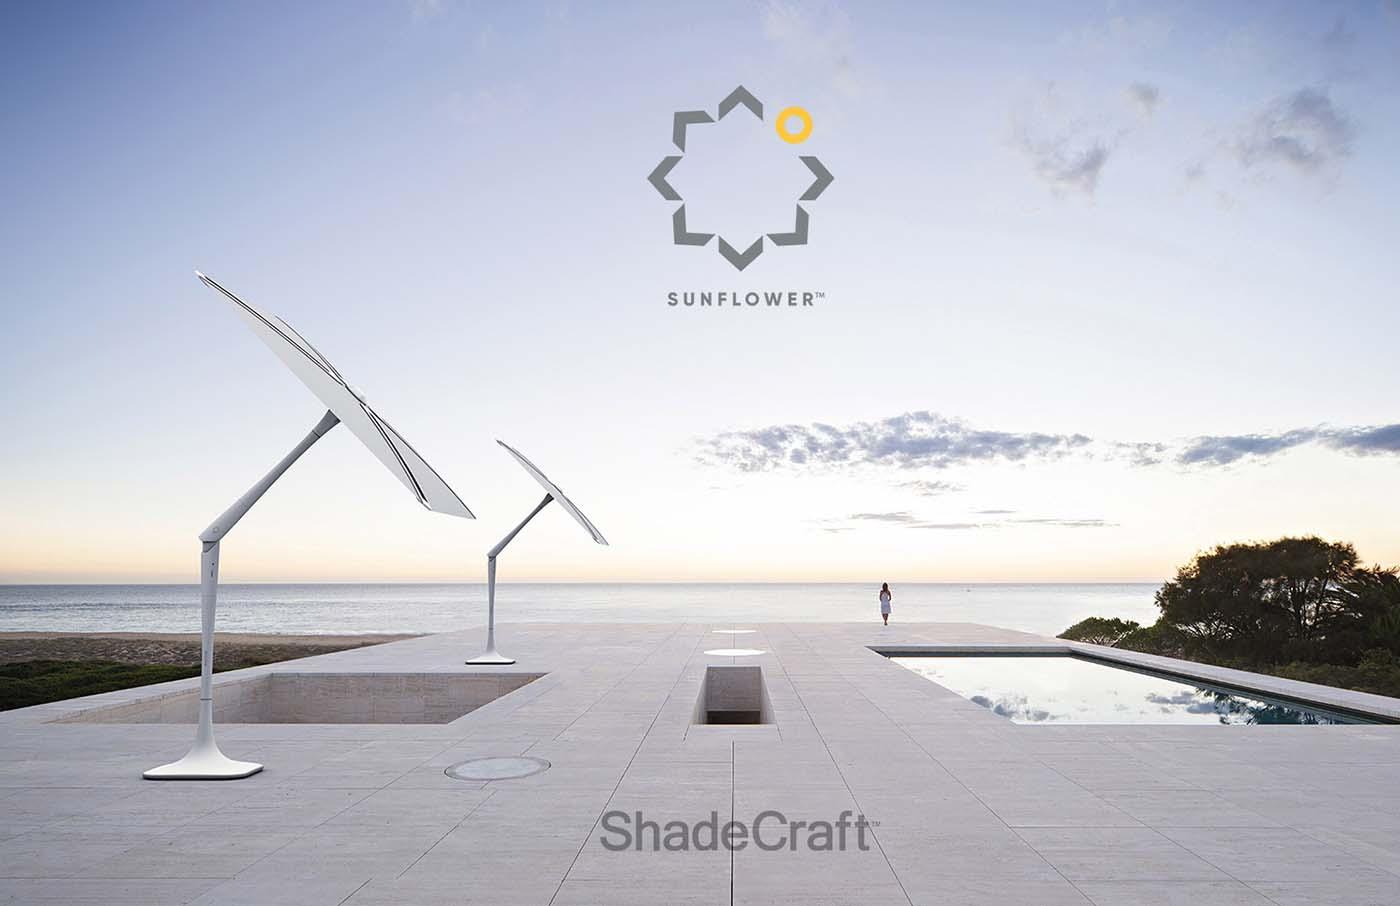 Sunflower ShadeCraft